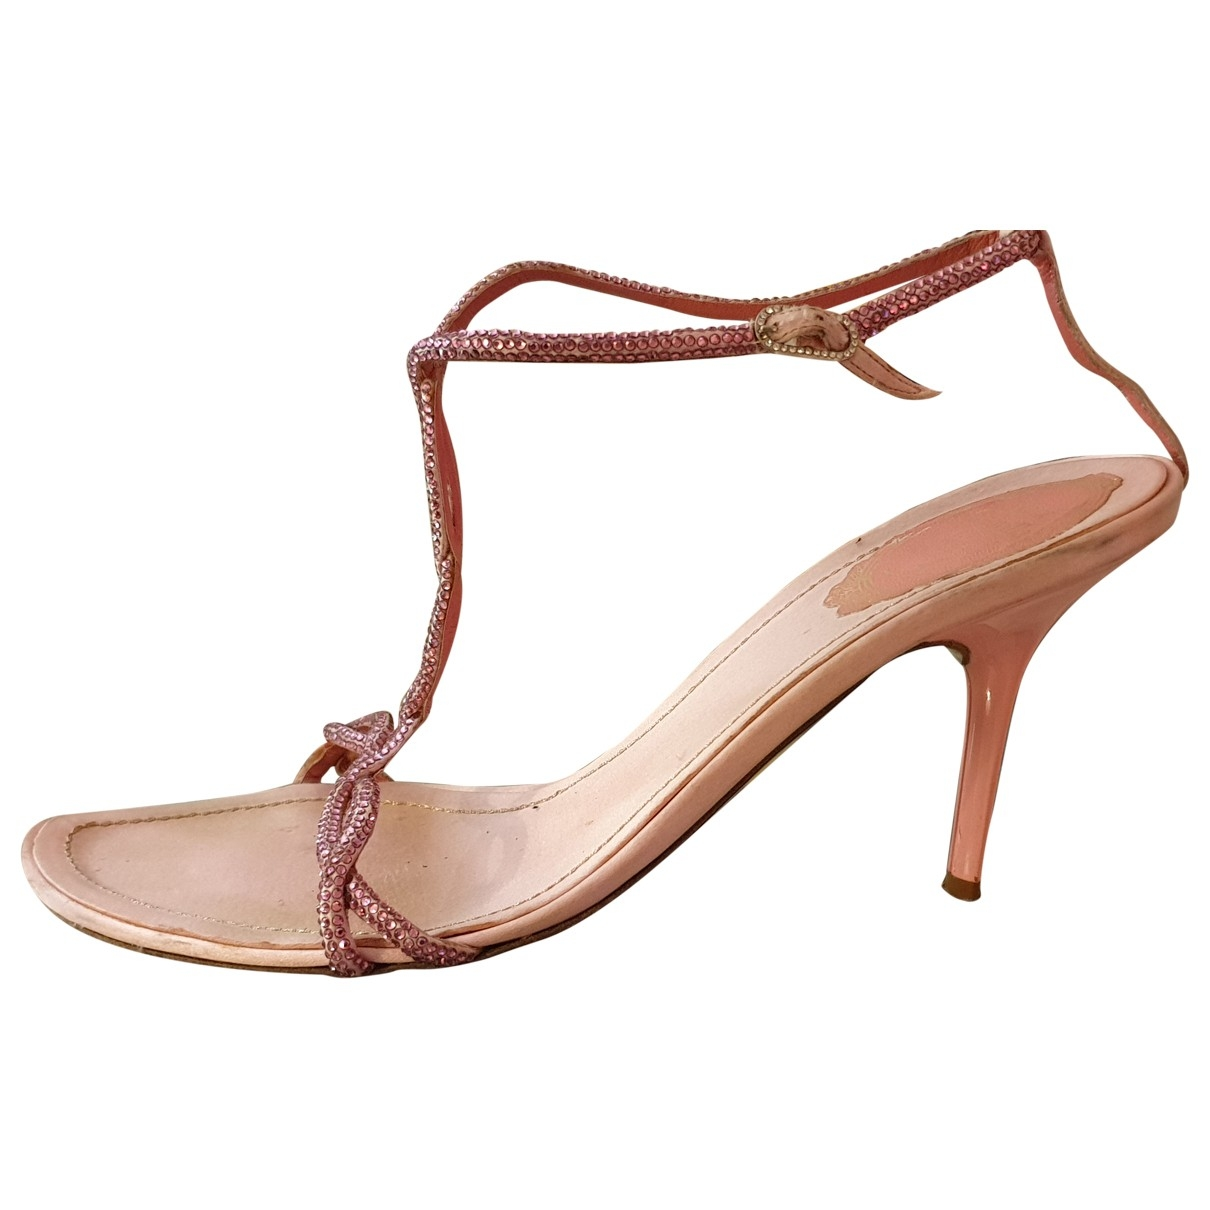 Sandalias de Con lentejuelas Rene Caovilla